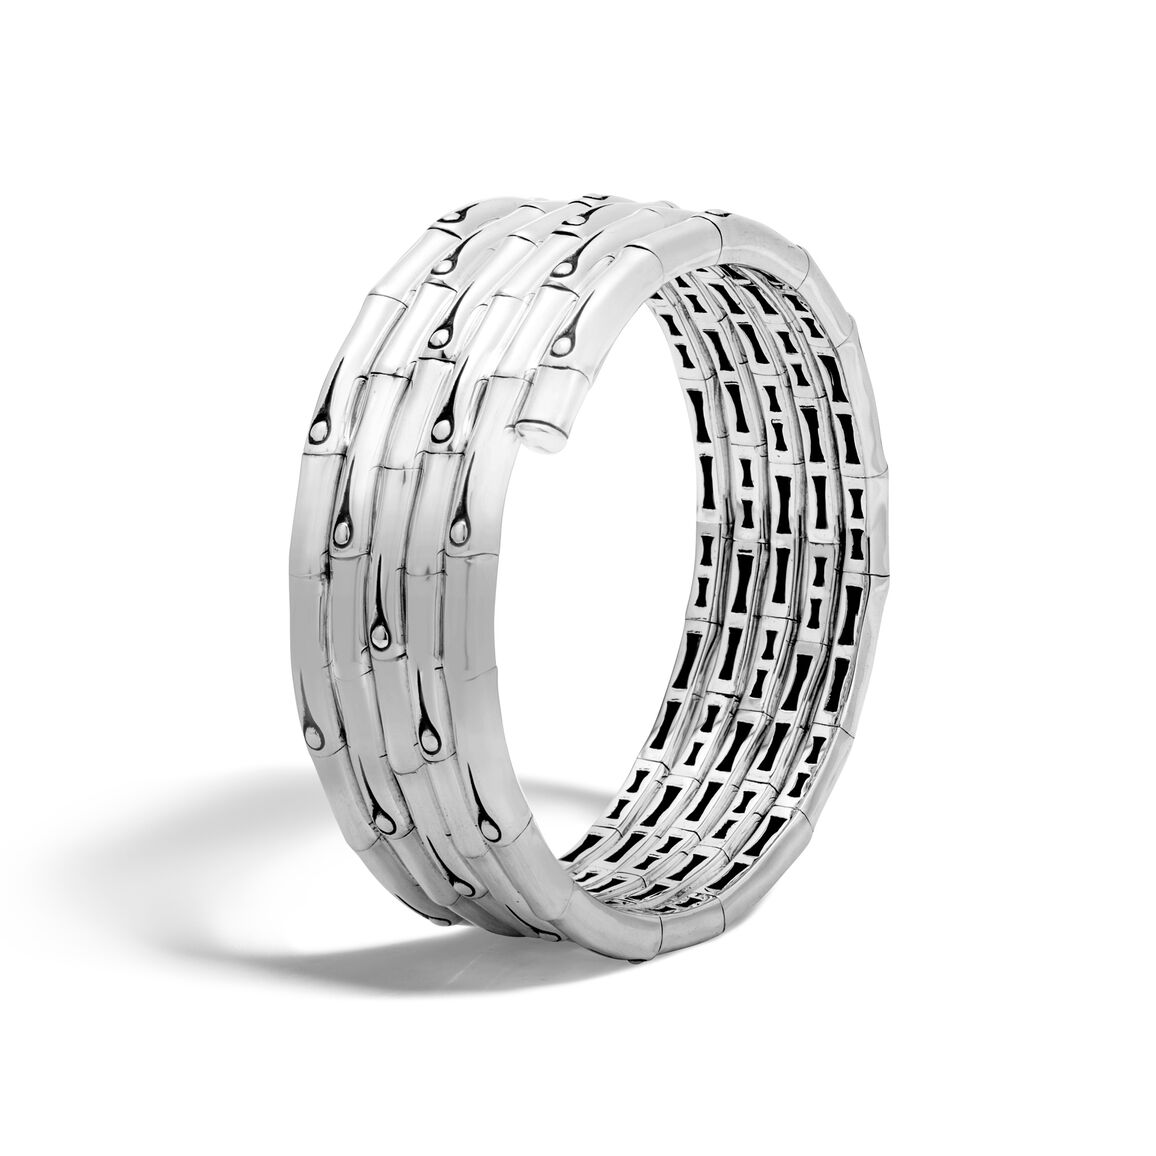 Bamboo Multiple coil Bracelet in Silver